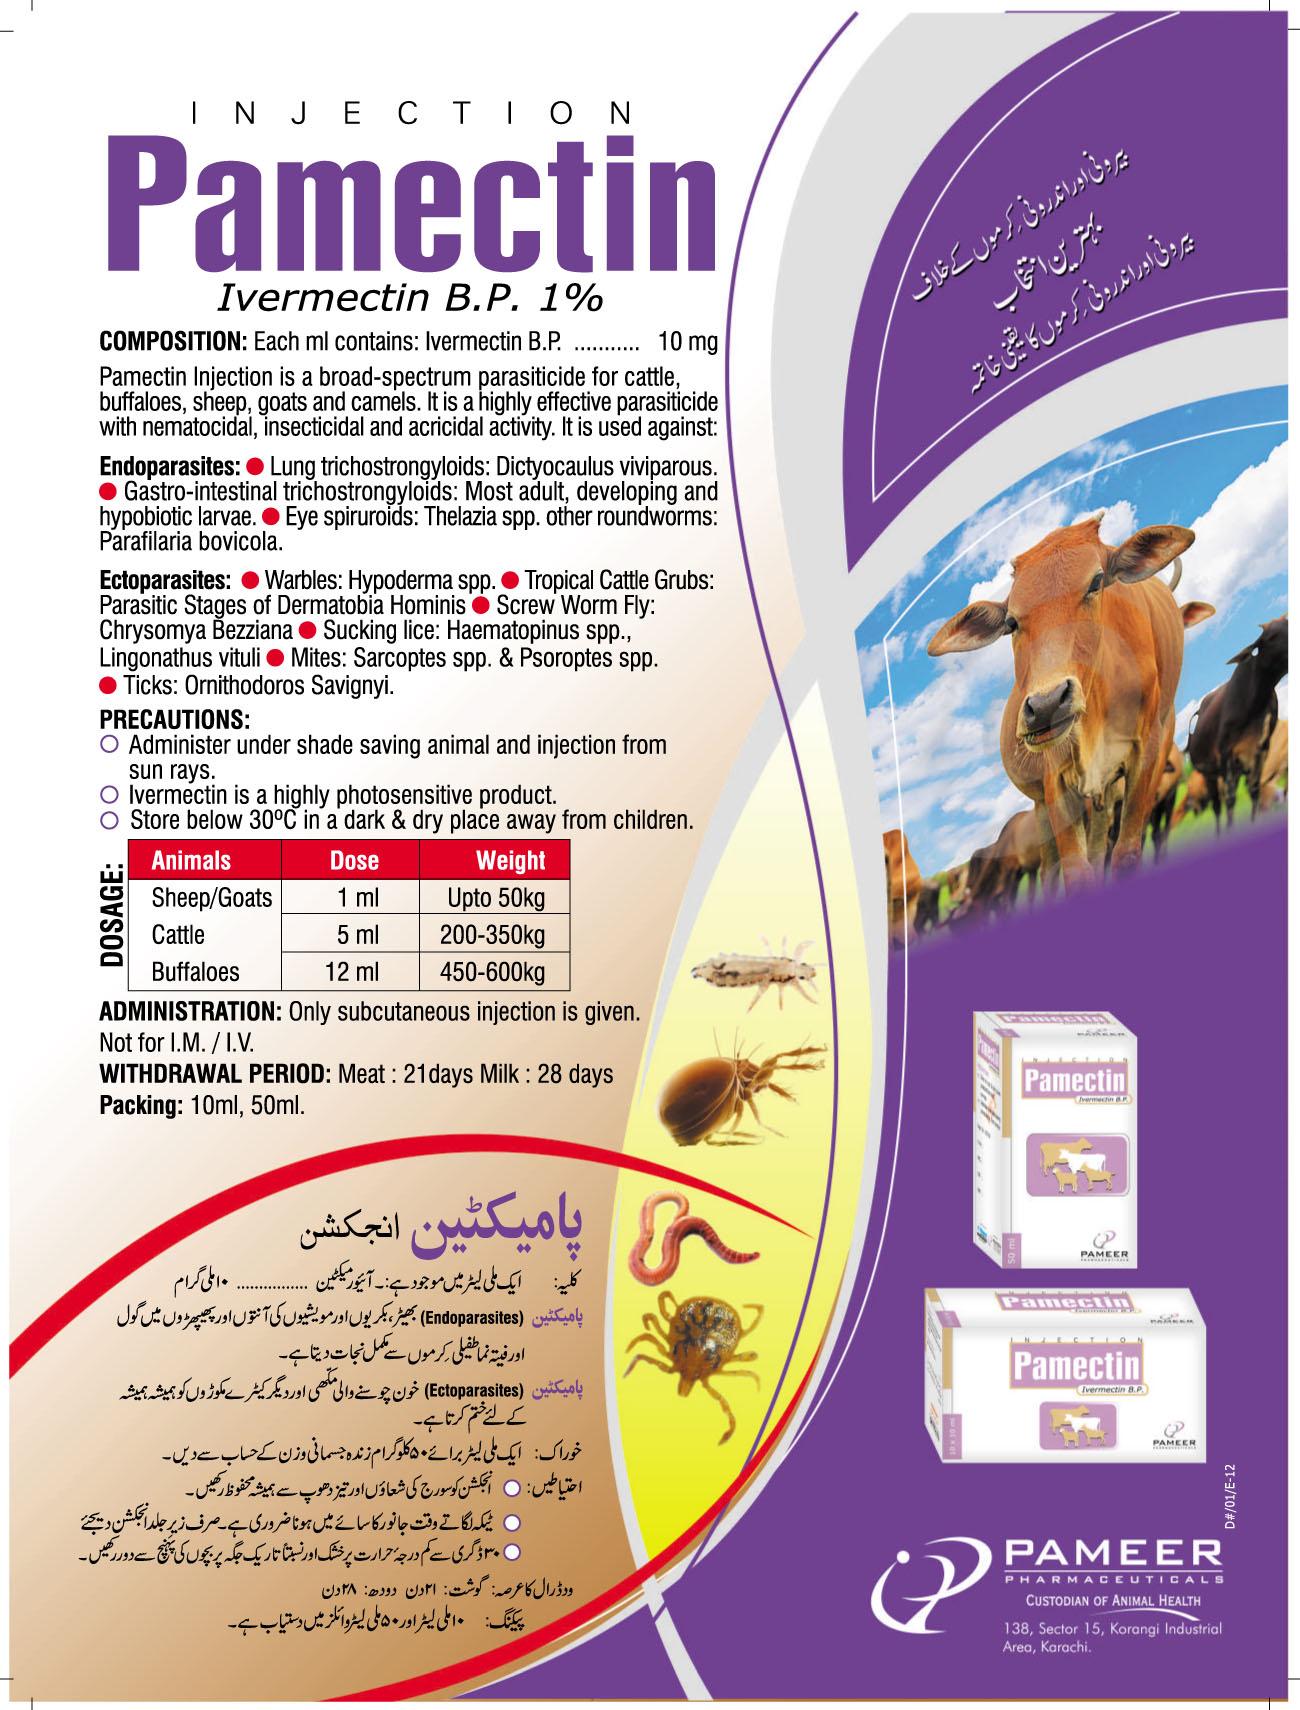 Pamectin Injection!